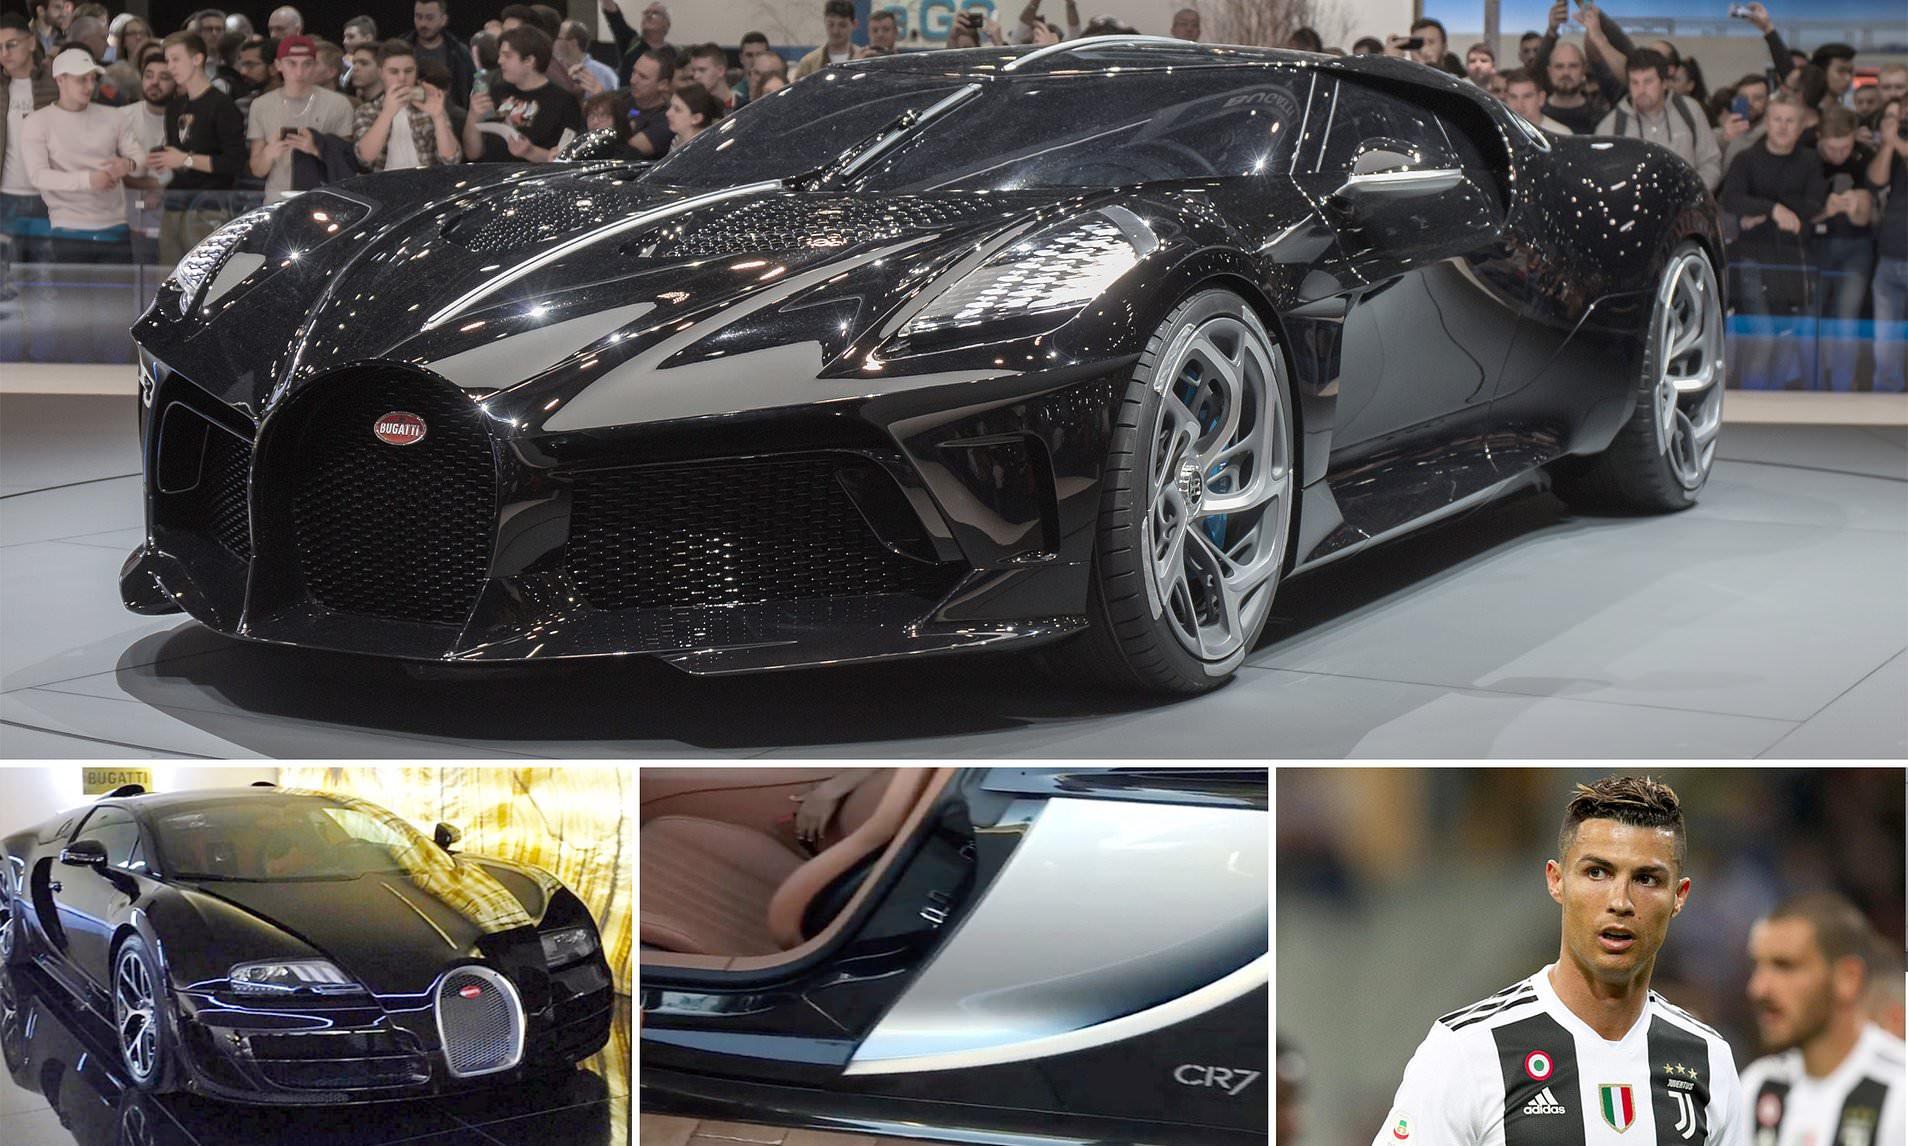 Cristiano Ronaldo 'buys world's most expensive car' a 9.5m one-off Bugatti La Voiture Noire (Photos)